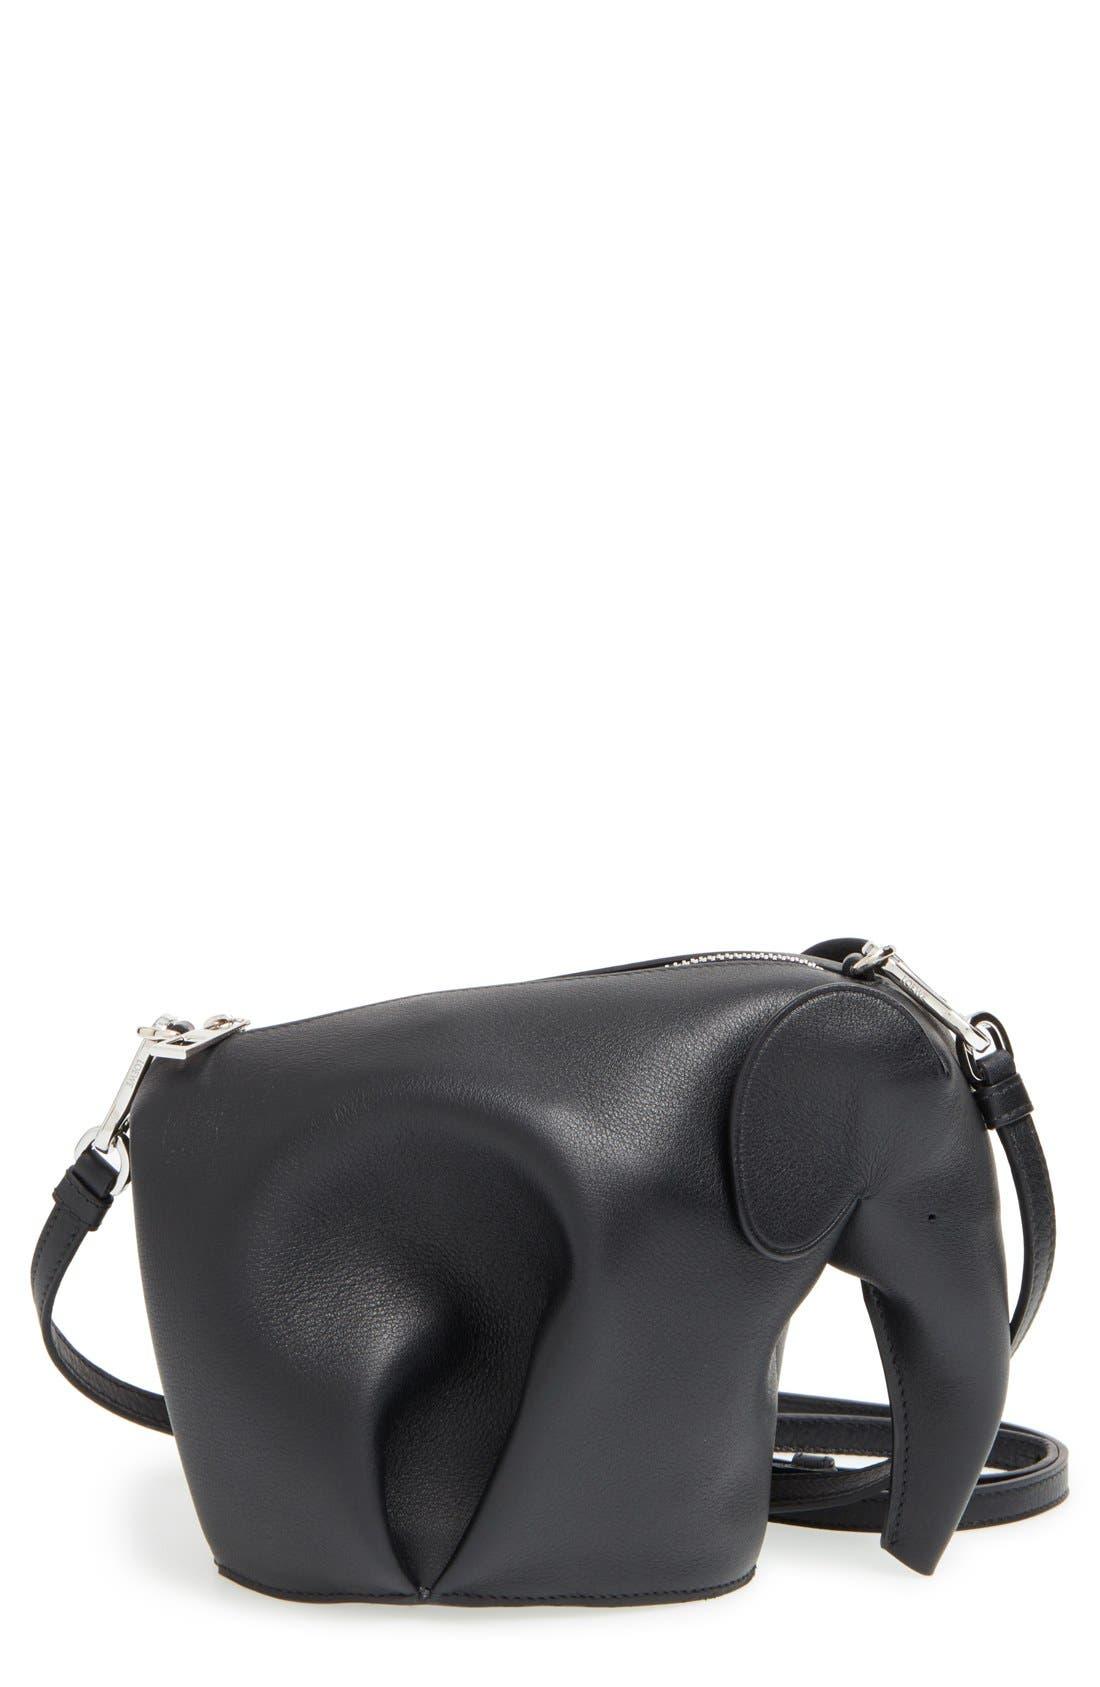 Main Image - Loewe 'Mini Elephant' Crossbody Bag